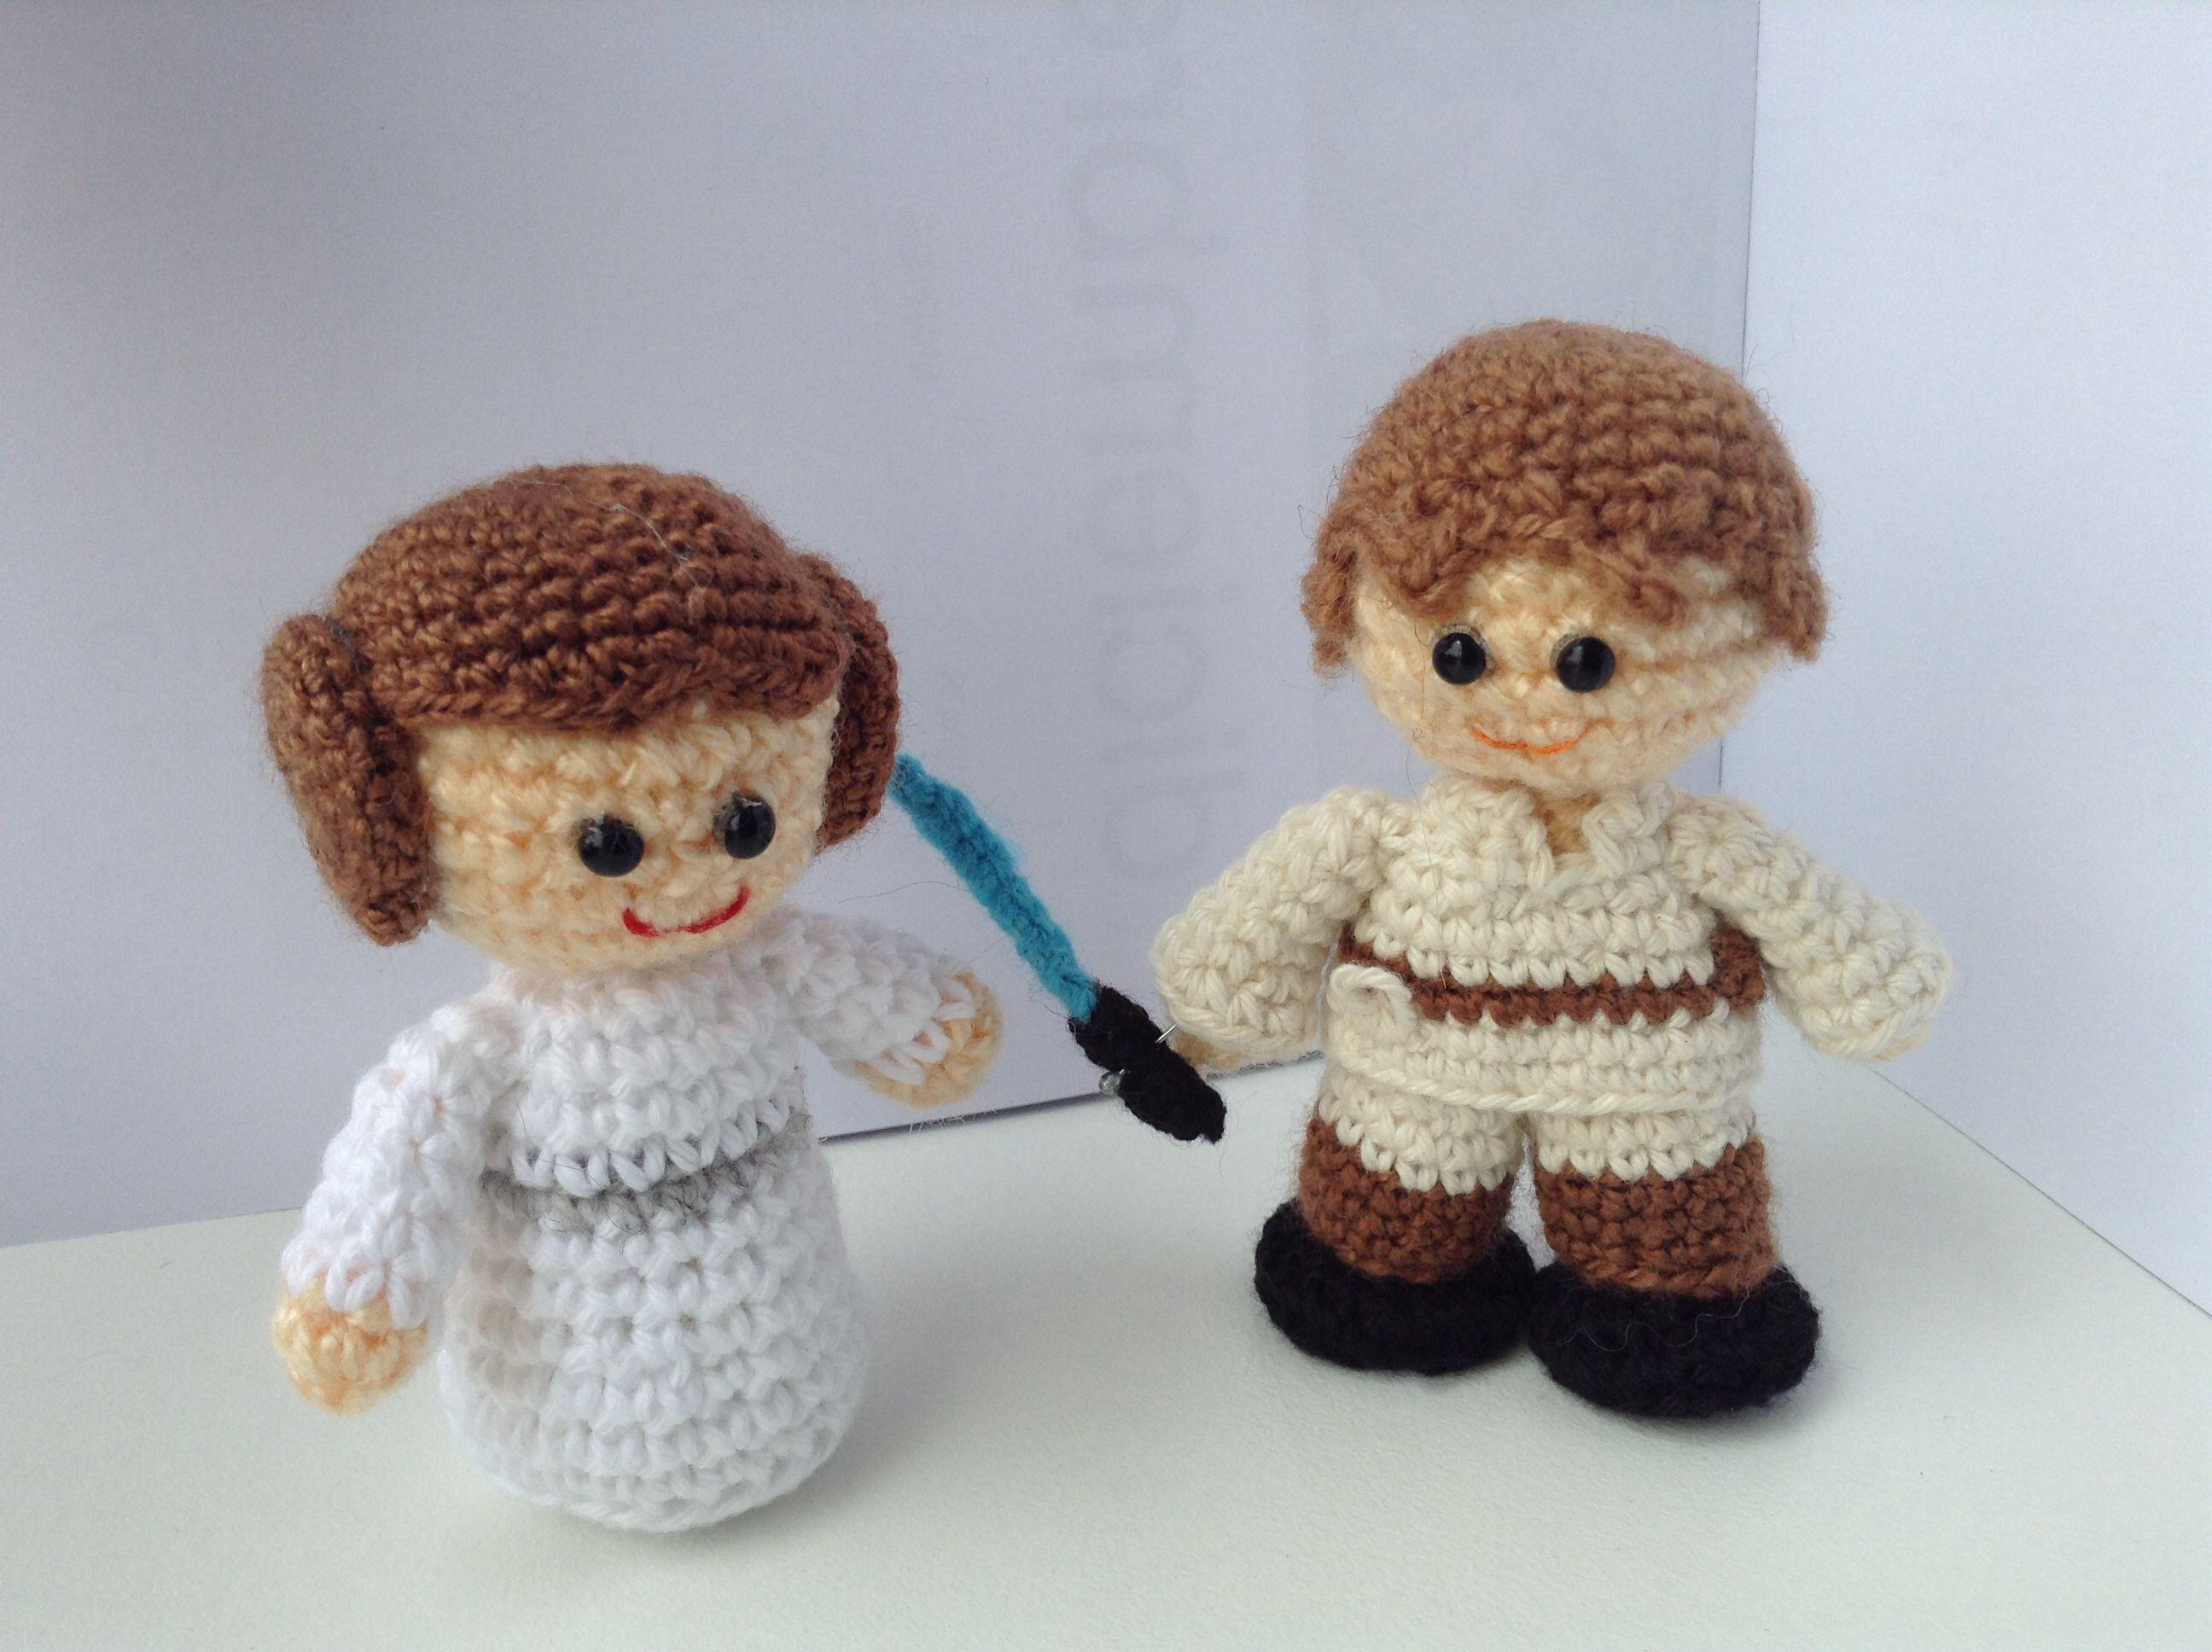 Amigurumi Star Wars : Leia luke skywalker crochet amigurumi star wars cute handmade